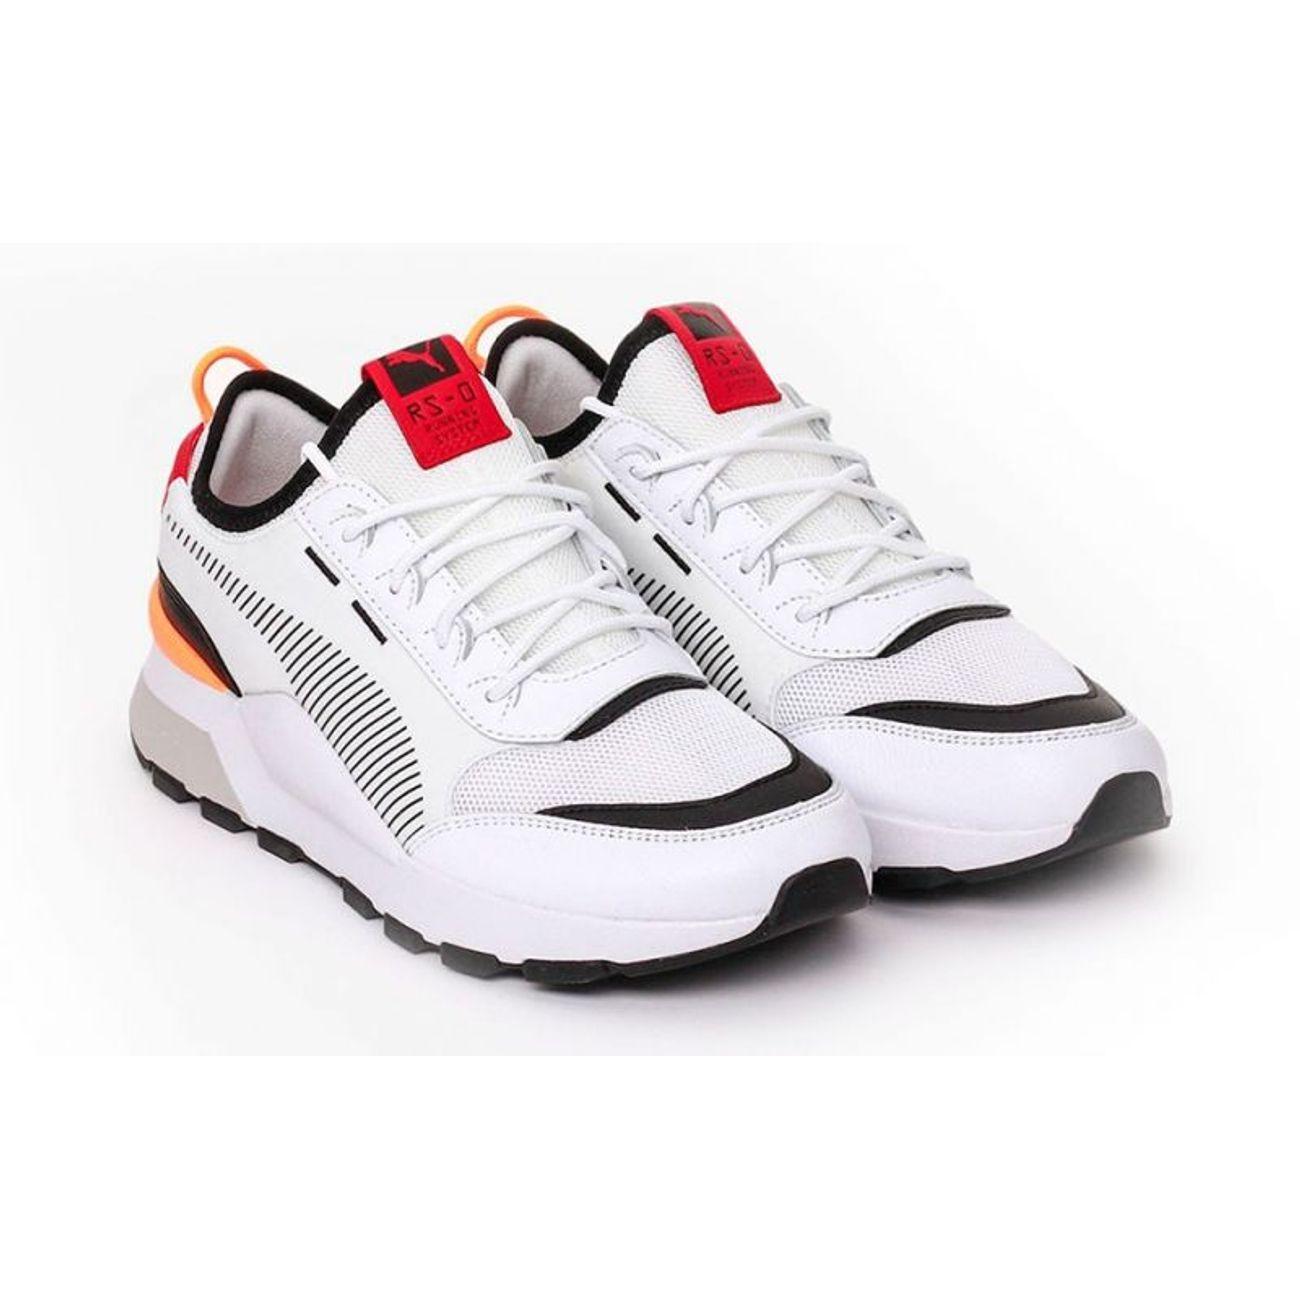 Rs Blanc 06 Puma Jaune Padel Adulte Tracks Noir 369362 0 Rouge nXN80PkOw